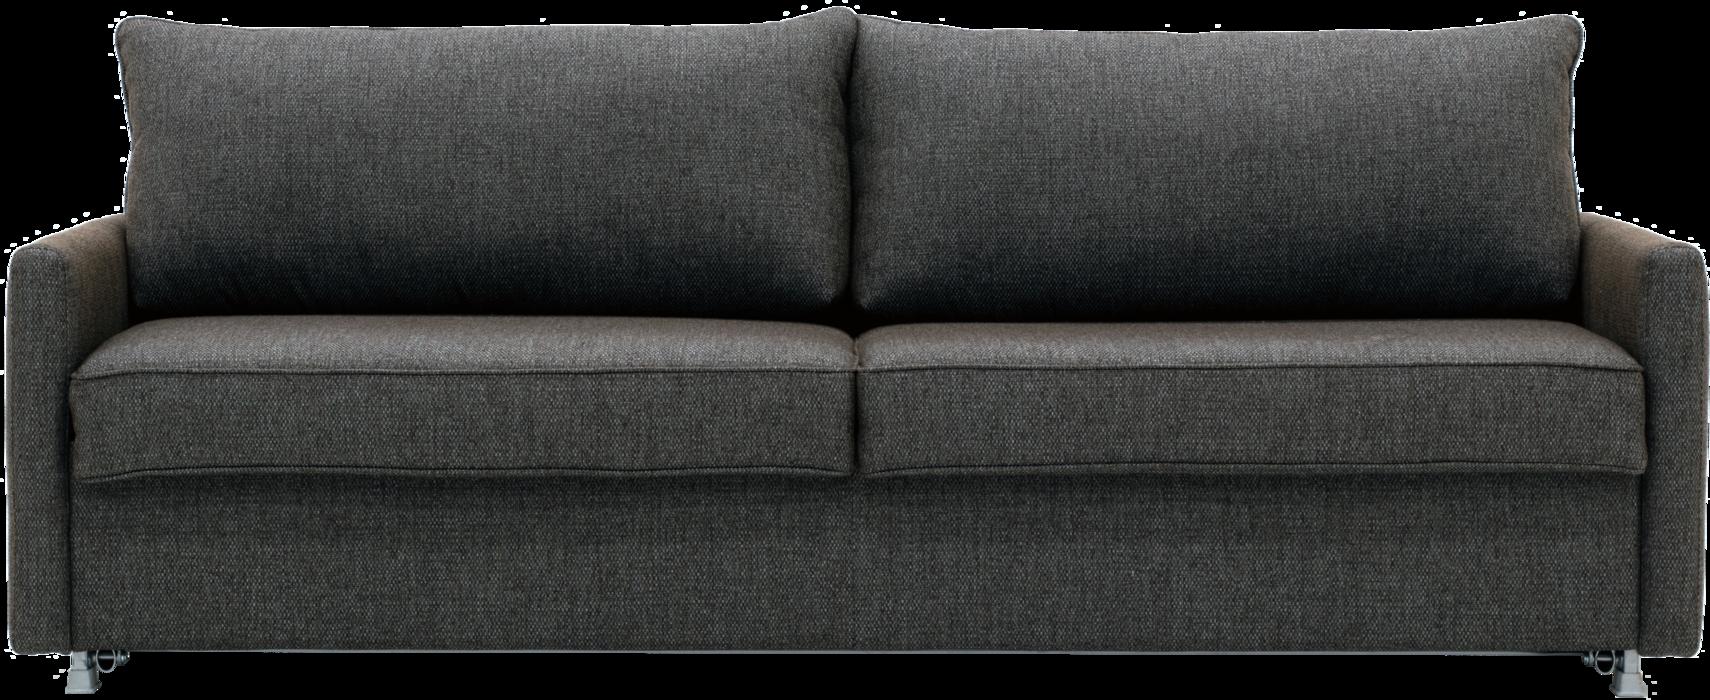 quality design c2261 f86c4 Elevate Bunk Bed | Luonto Furniture